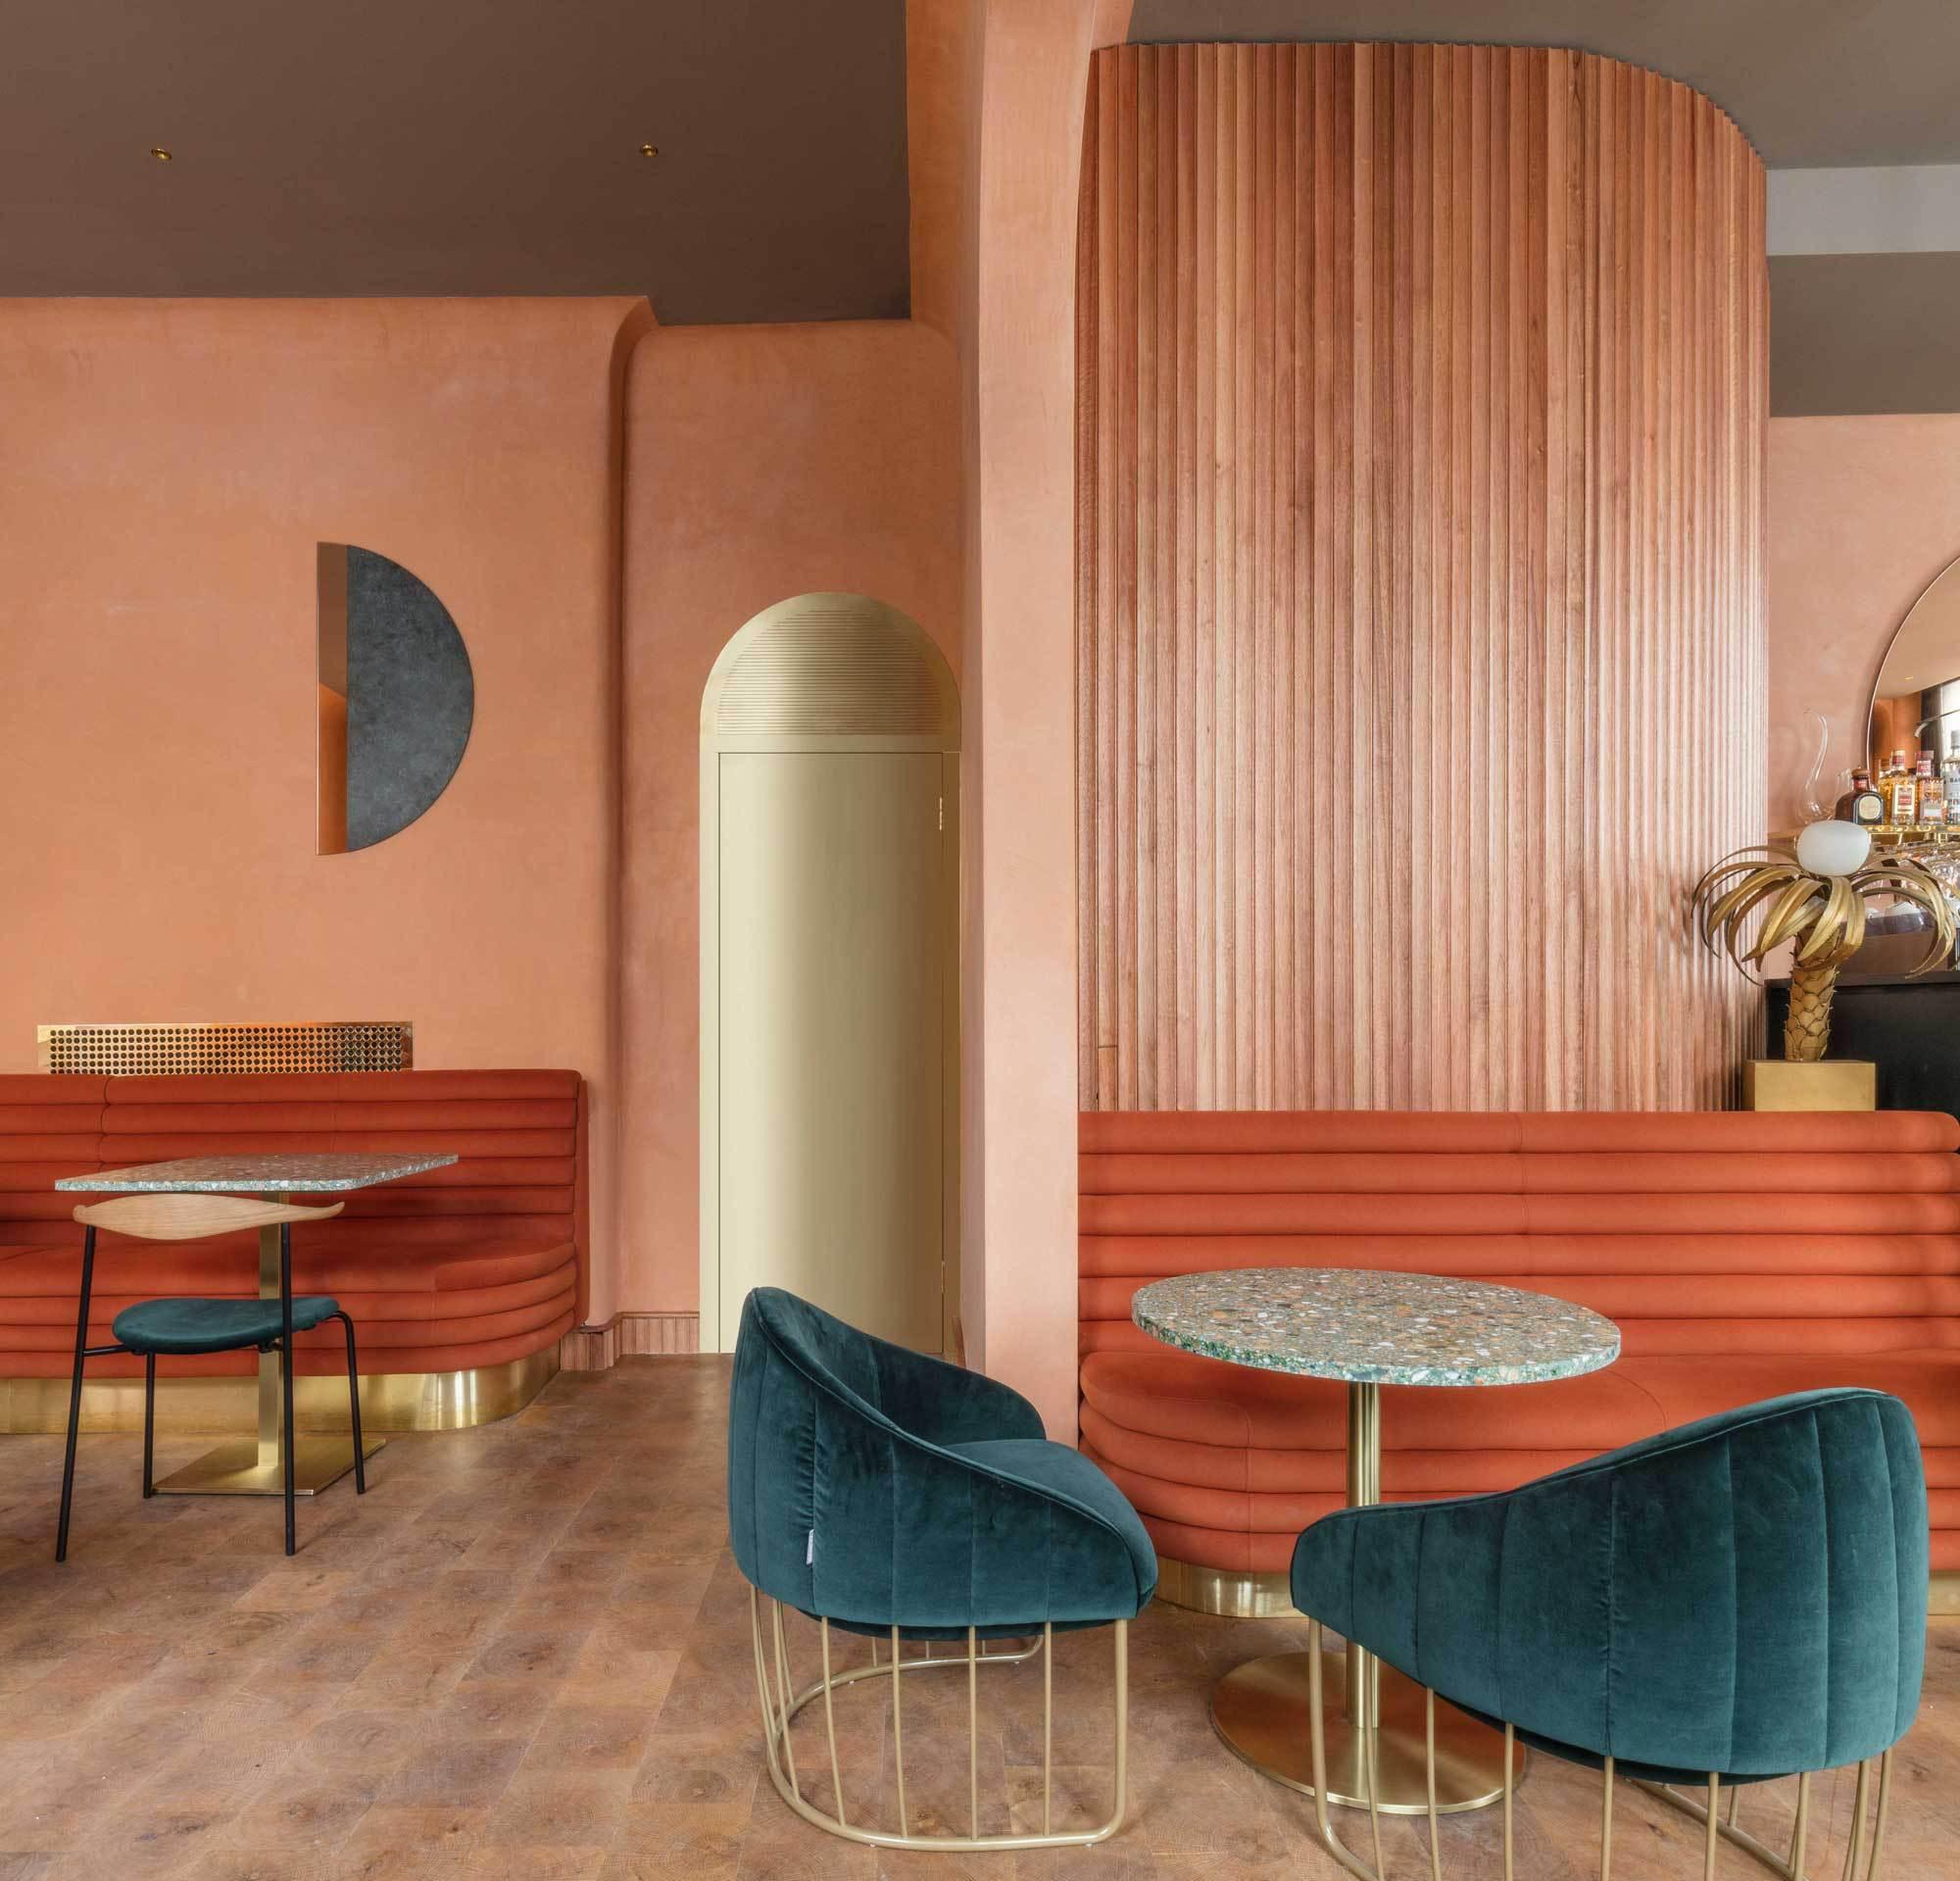 omars-place-stella-concept-restaurant-london-1.jpg